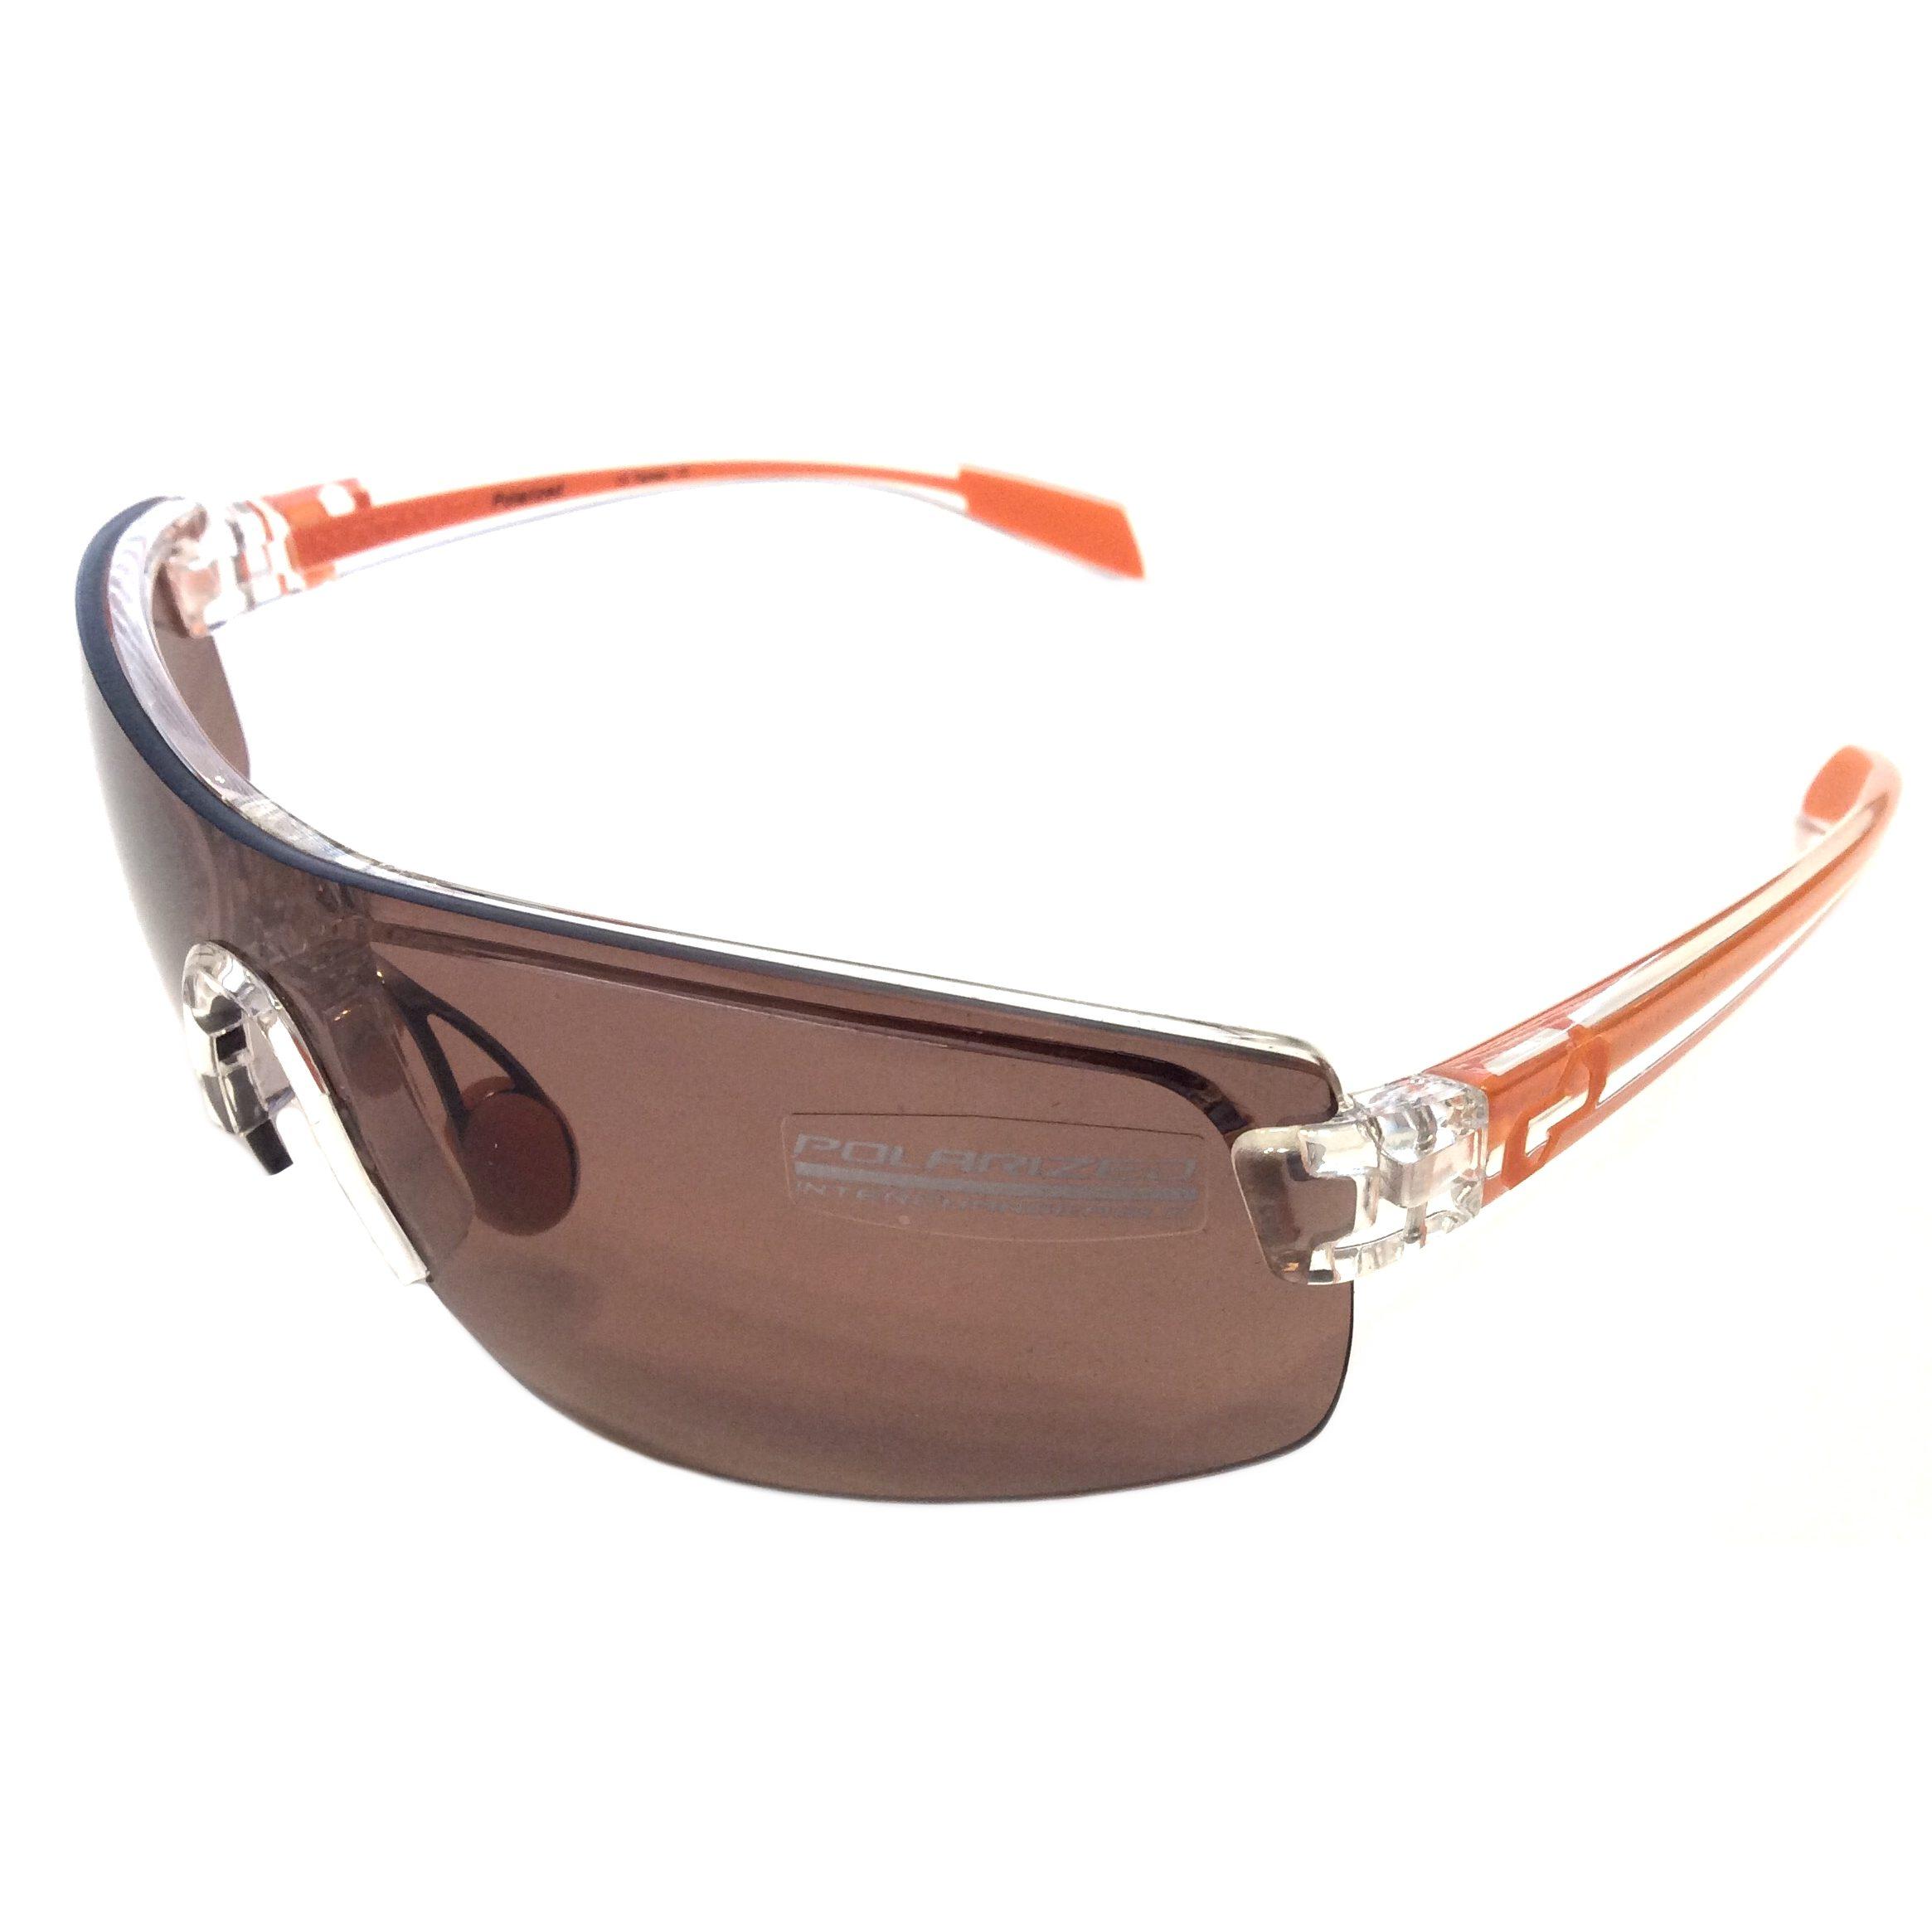 Native Eyewear Lynx Sunglasses - Crystal Orange POLARIZED Copper XTRA Lens